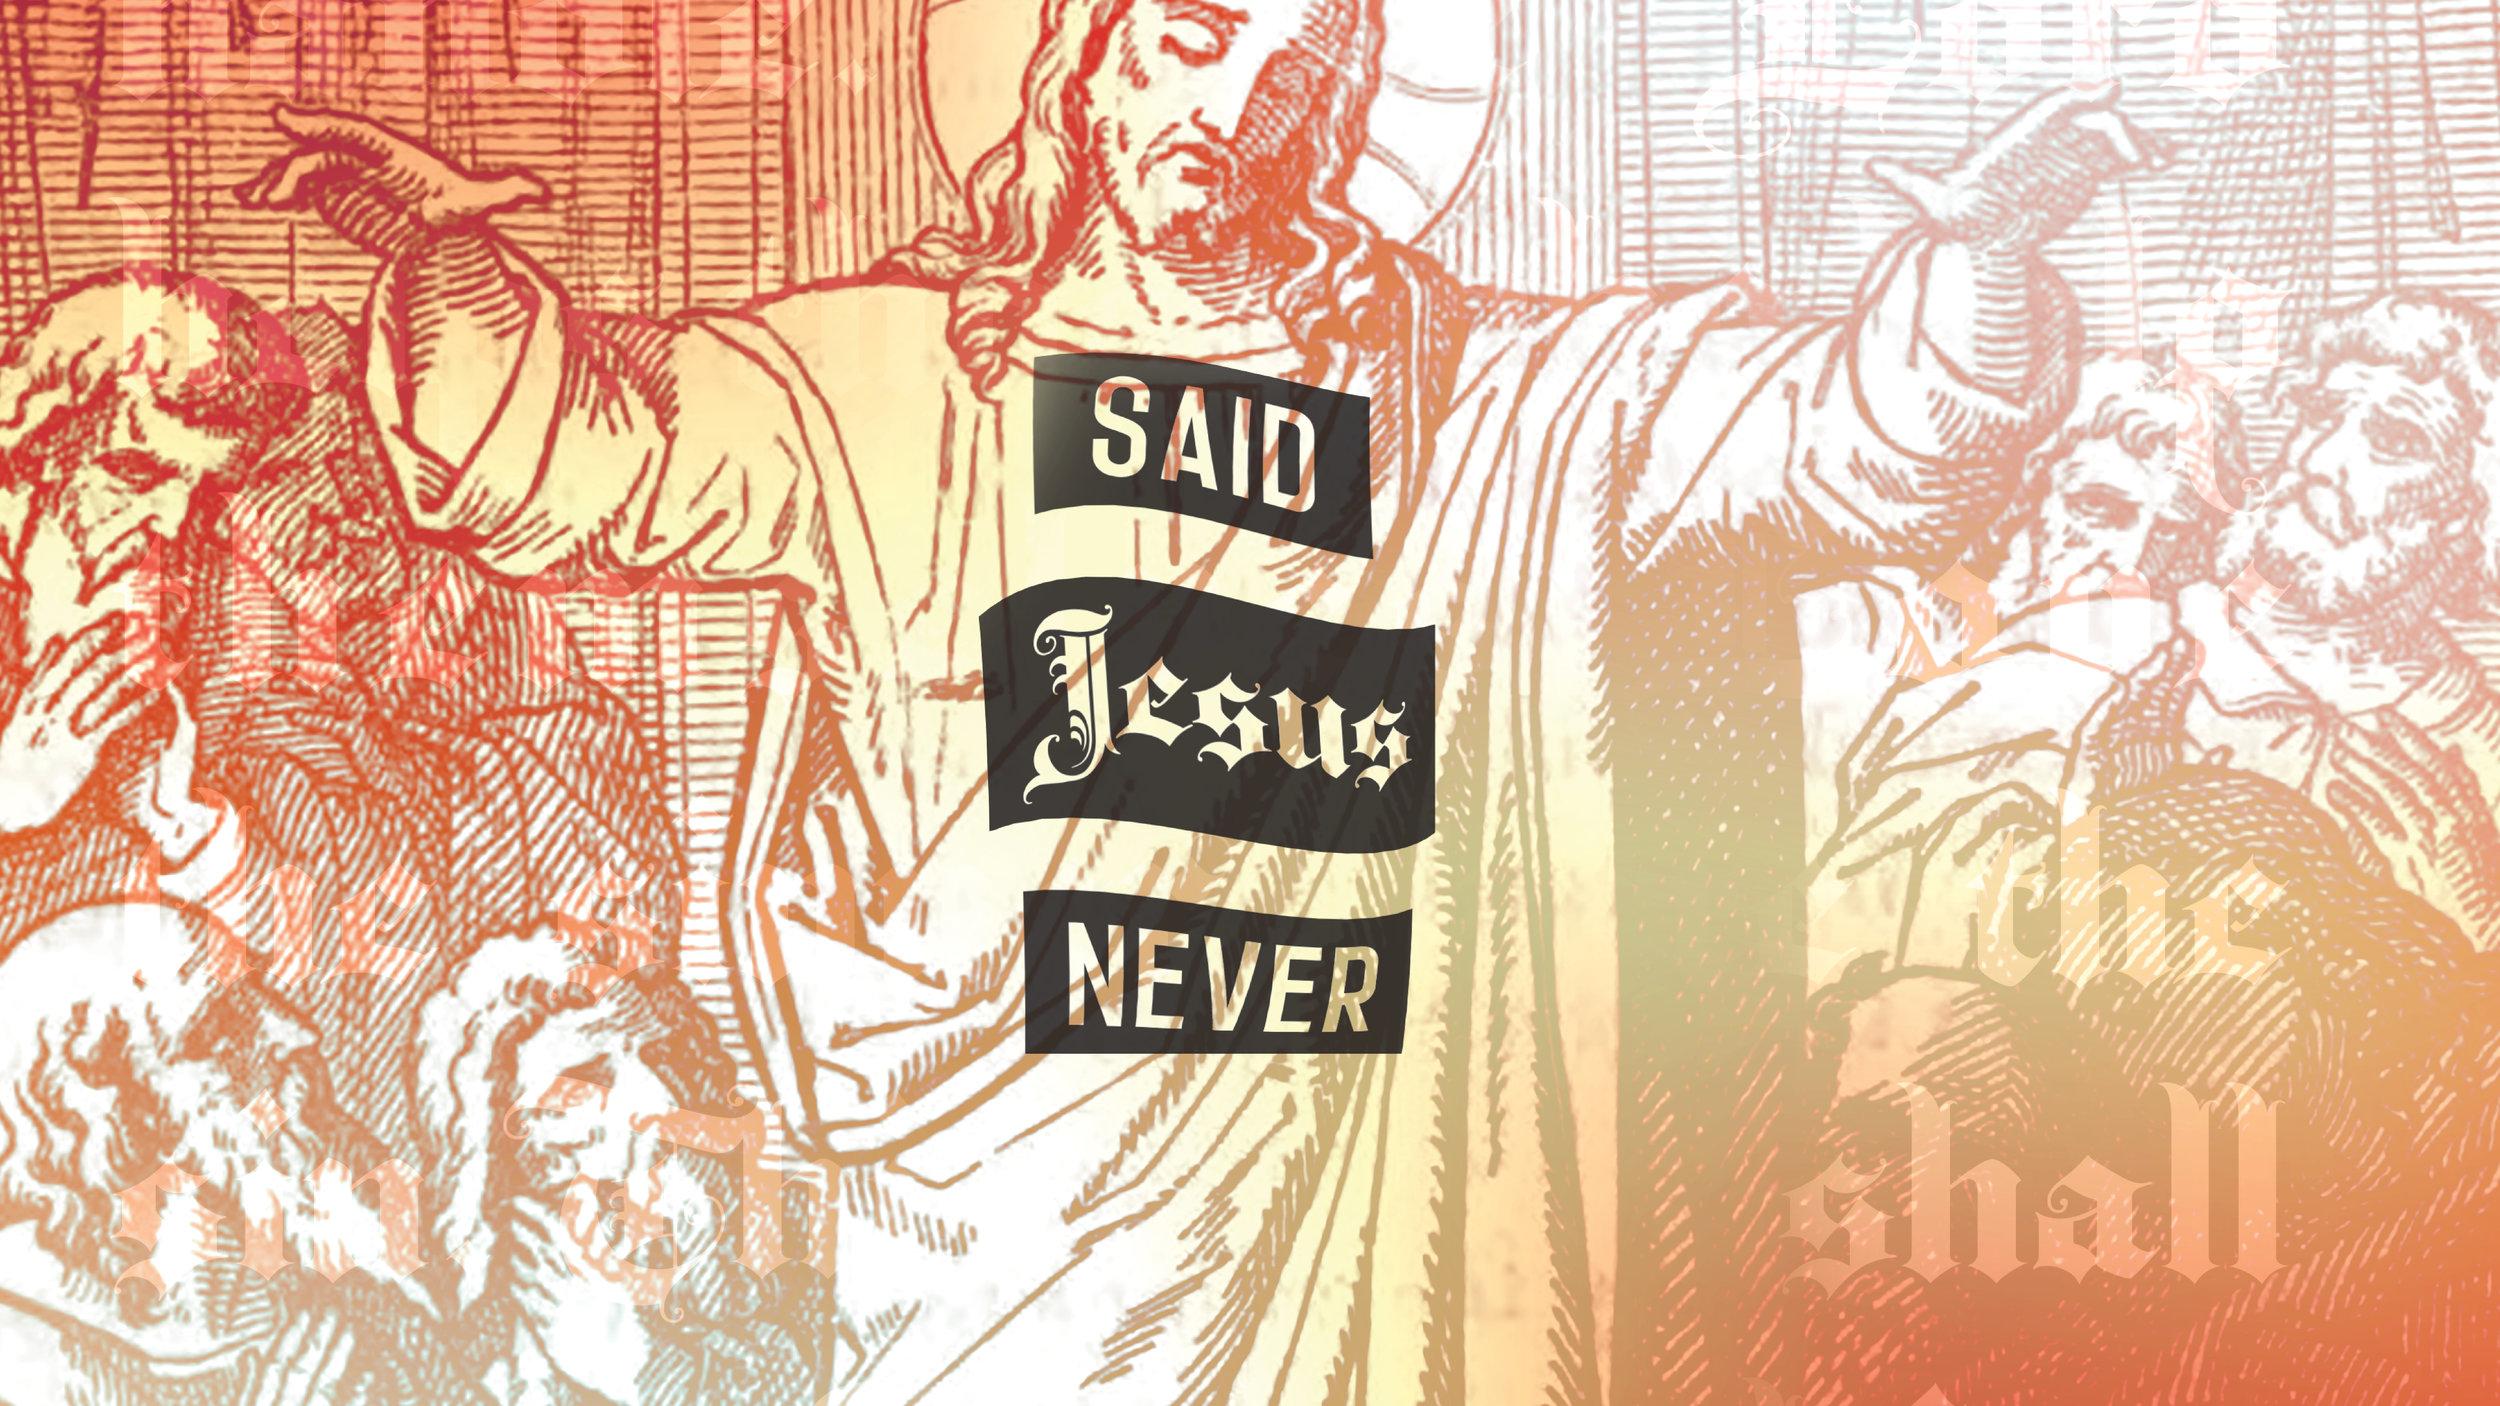 Said Jesus Never Red.jpg